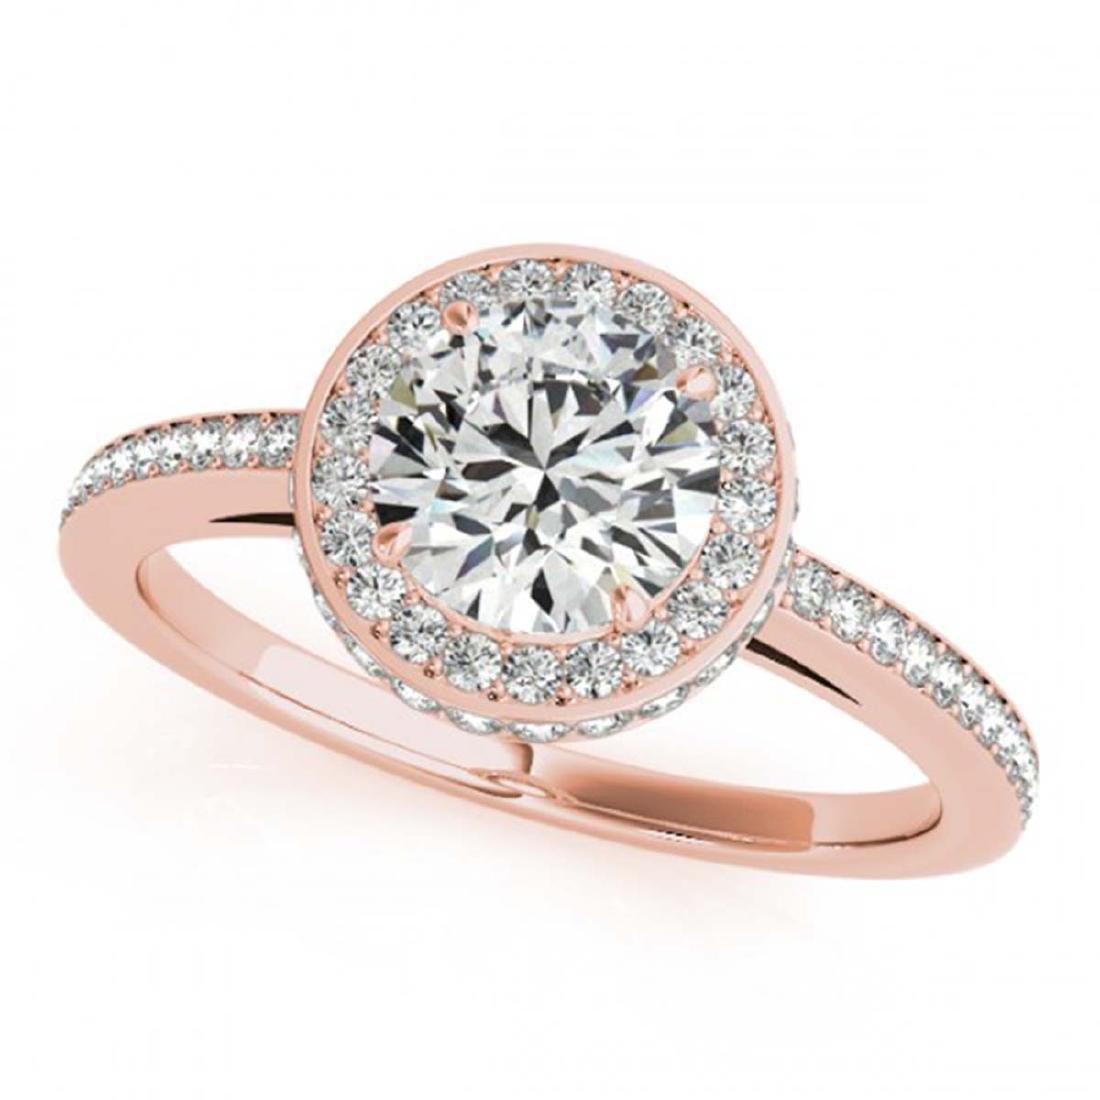 1.25 ctw VS/SI Diamond Solitaire Halo Ring 14K Rose - 2